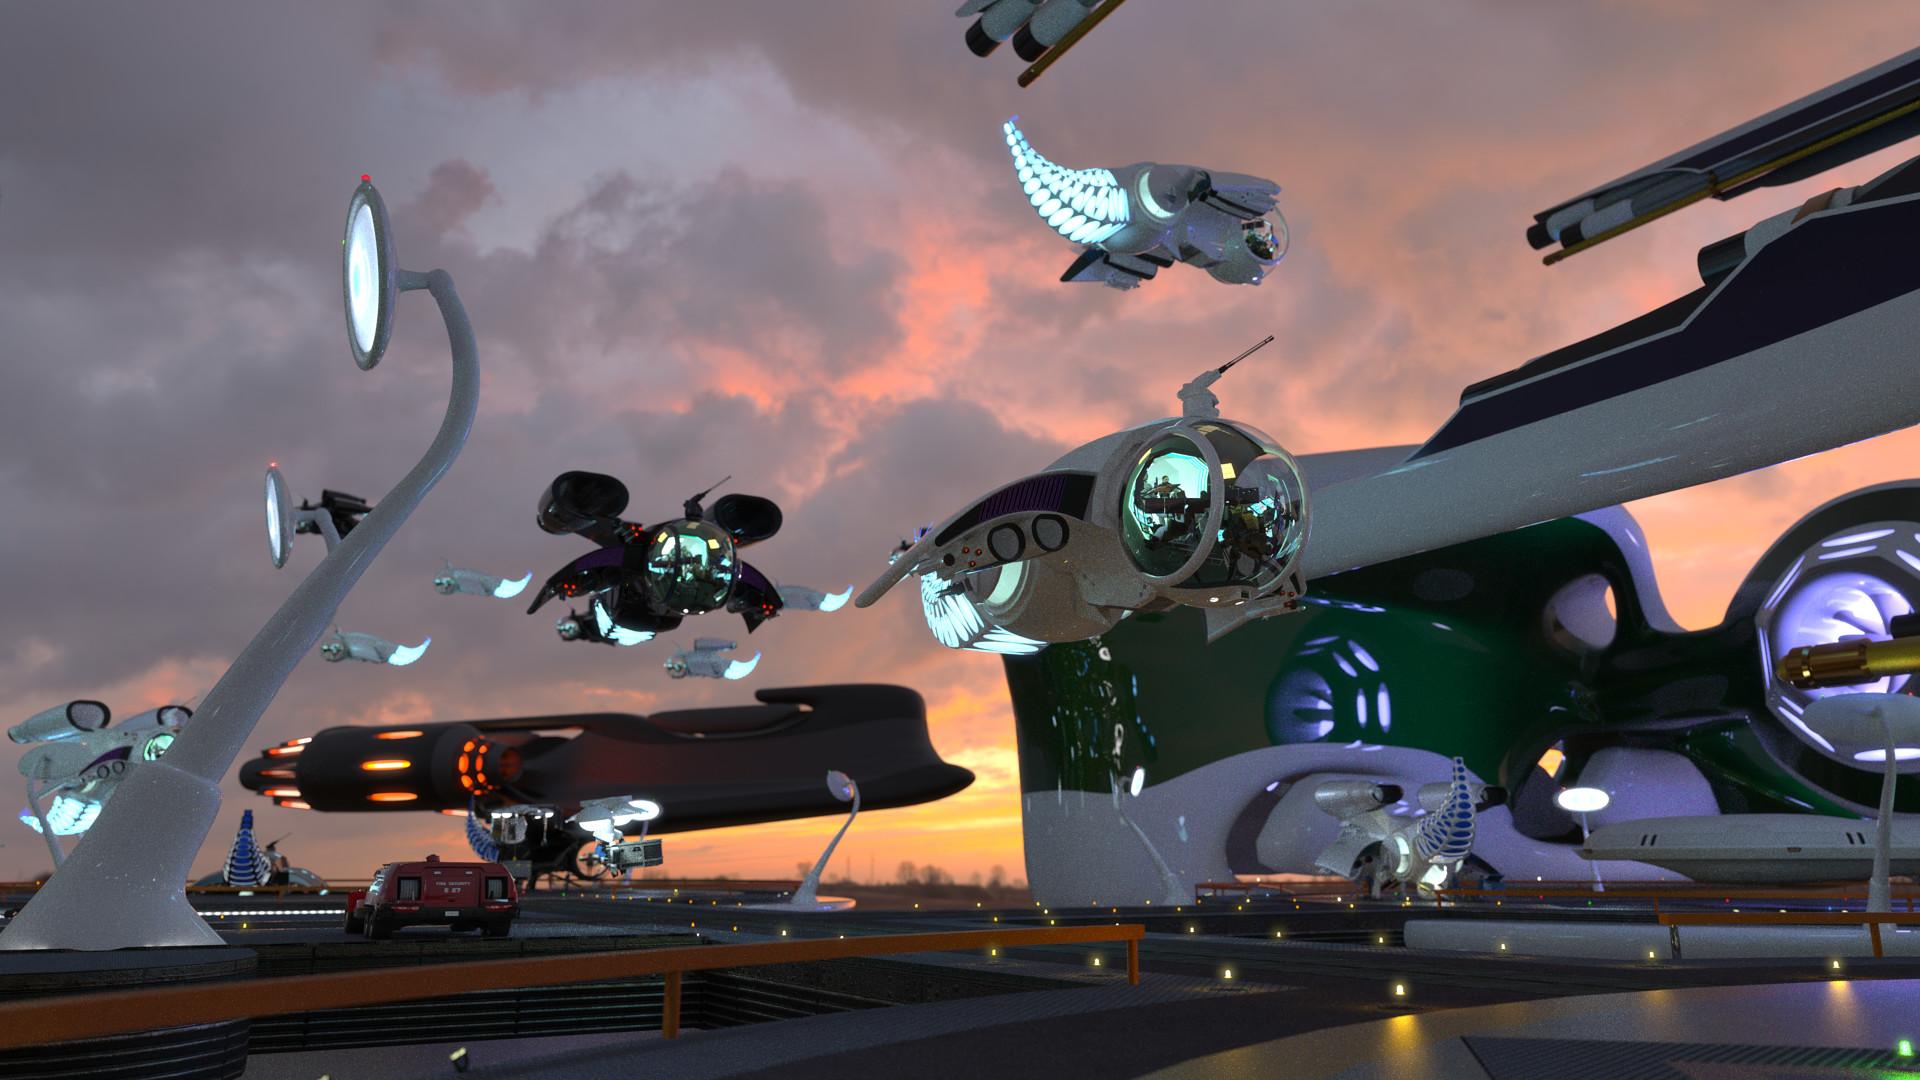 Duane kemp new city docks transfer full scale camera transfer subd2018 scene 65